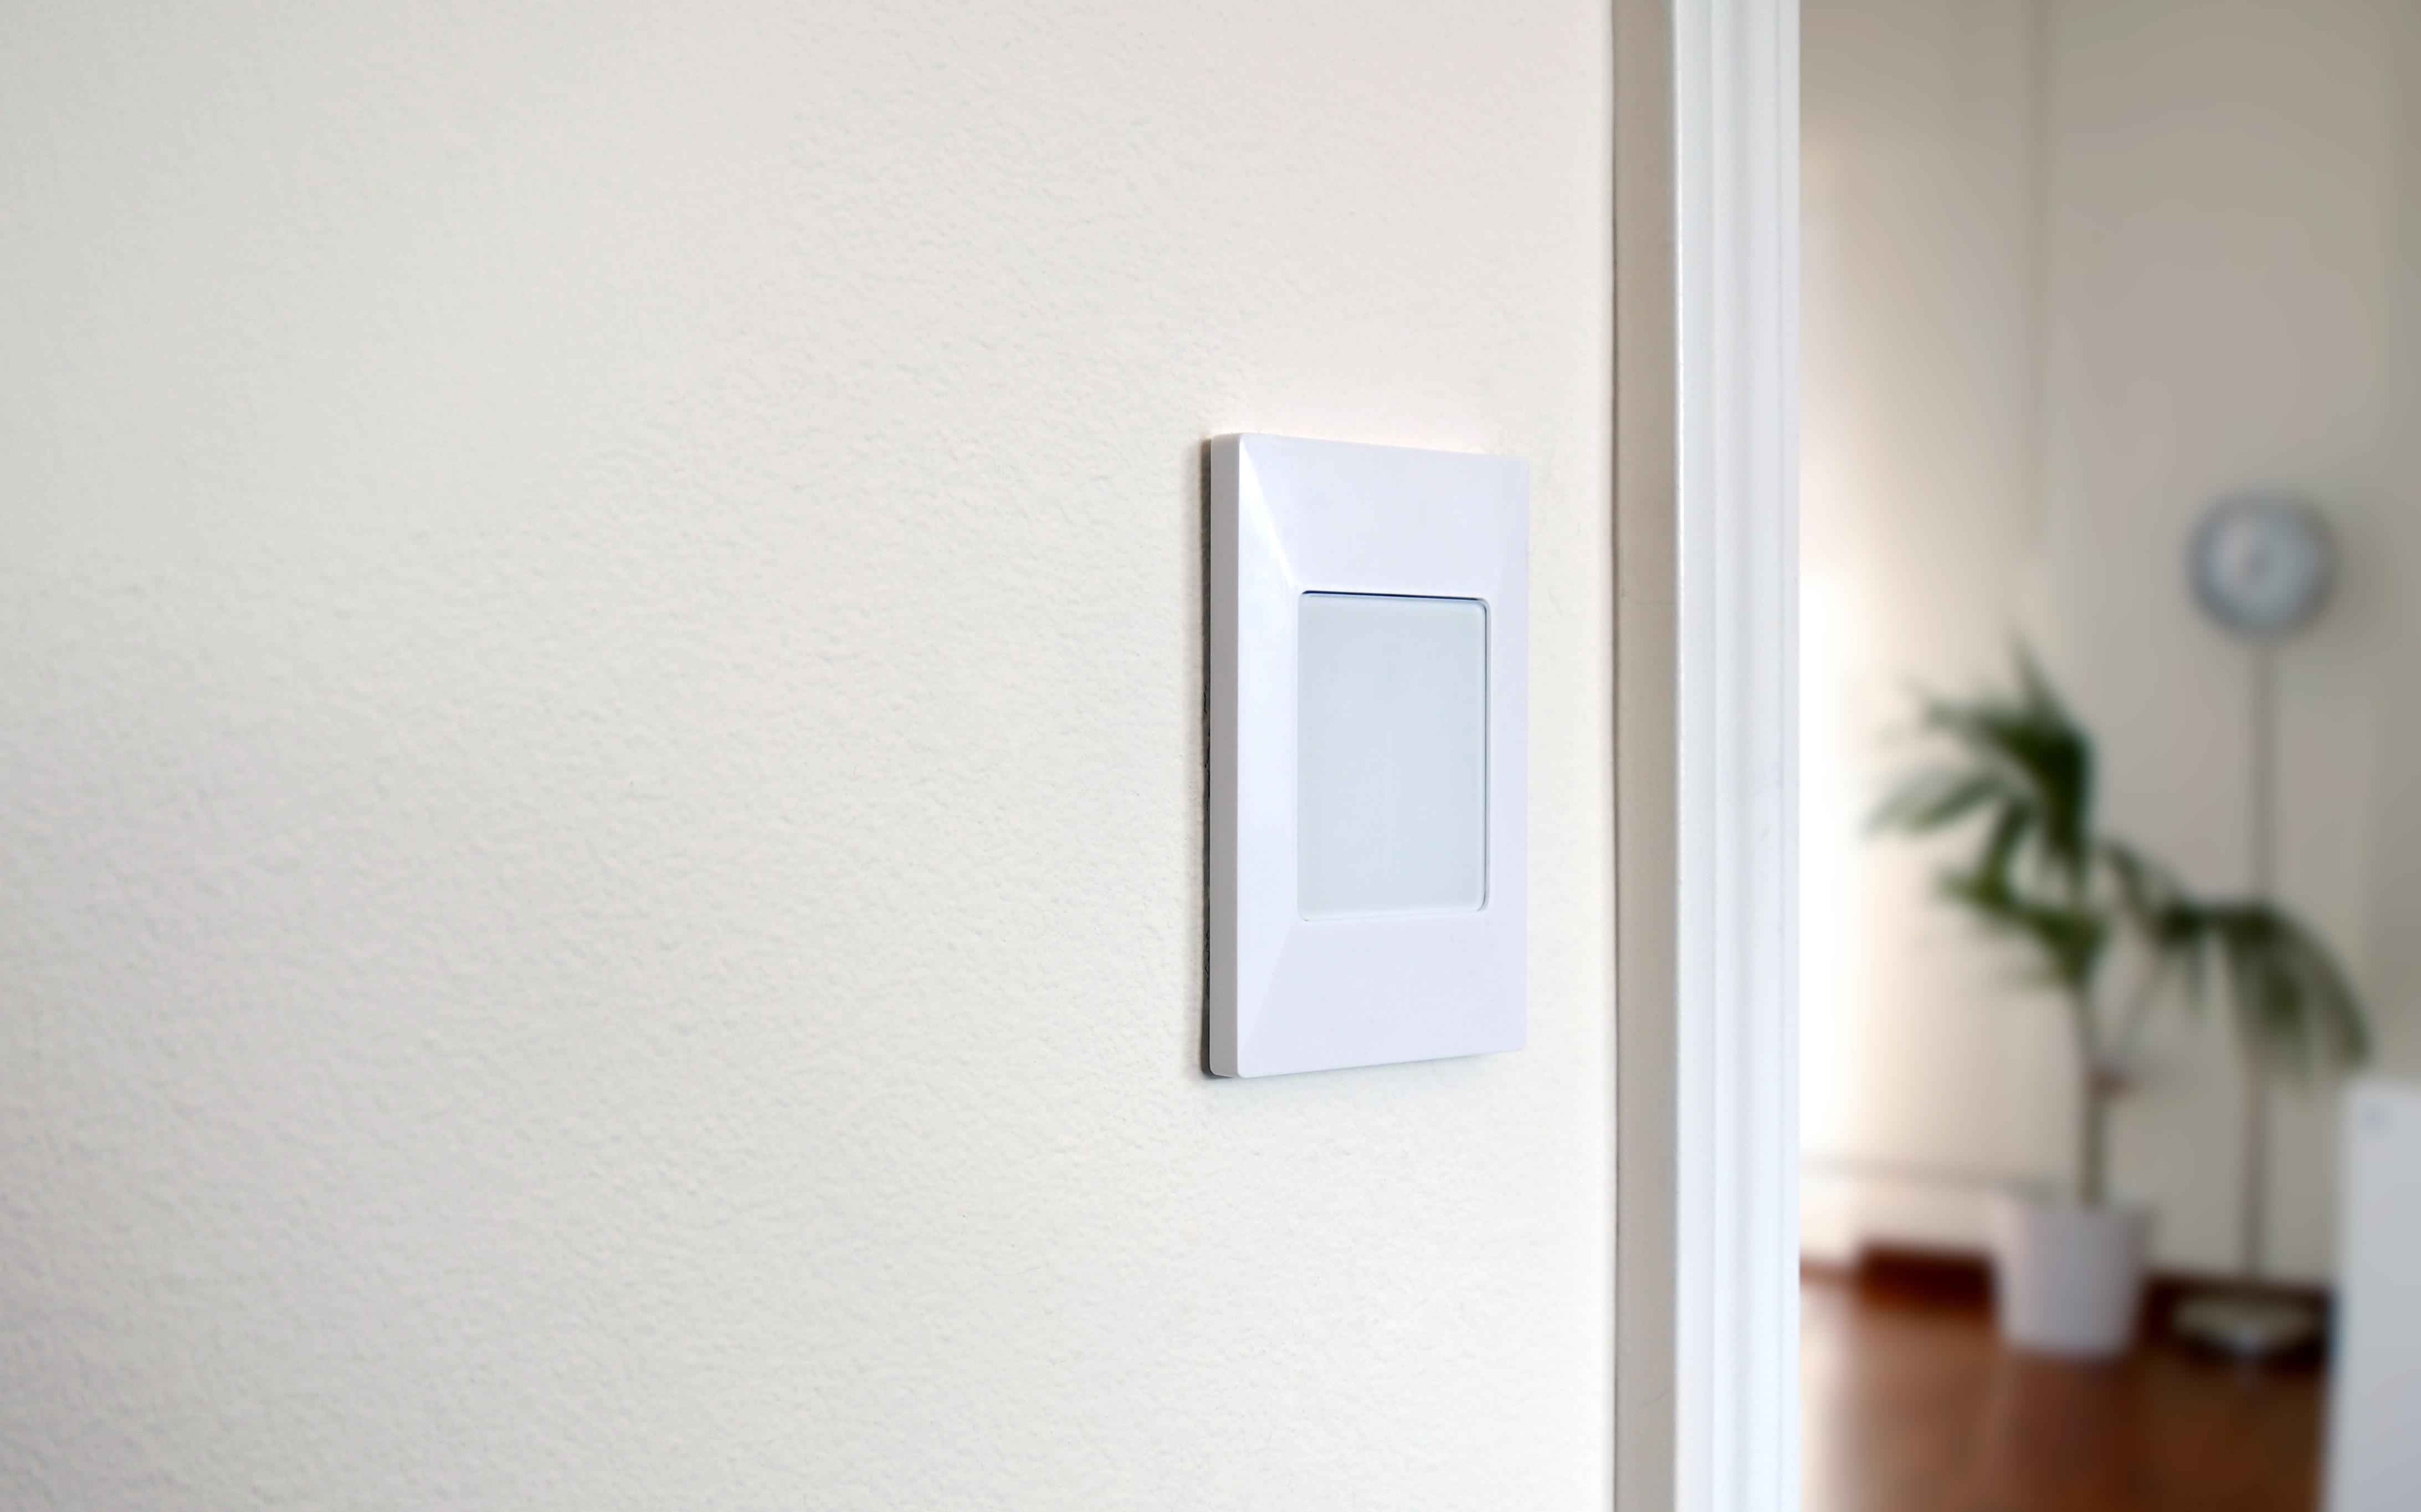 Y Combinator grad Deako raises $1.8M for smart-home light switches ...